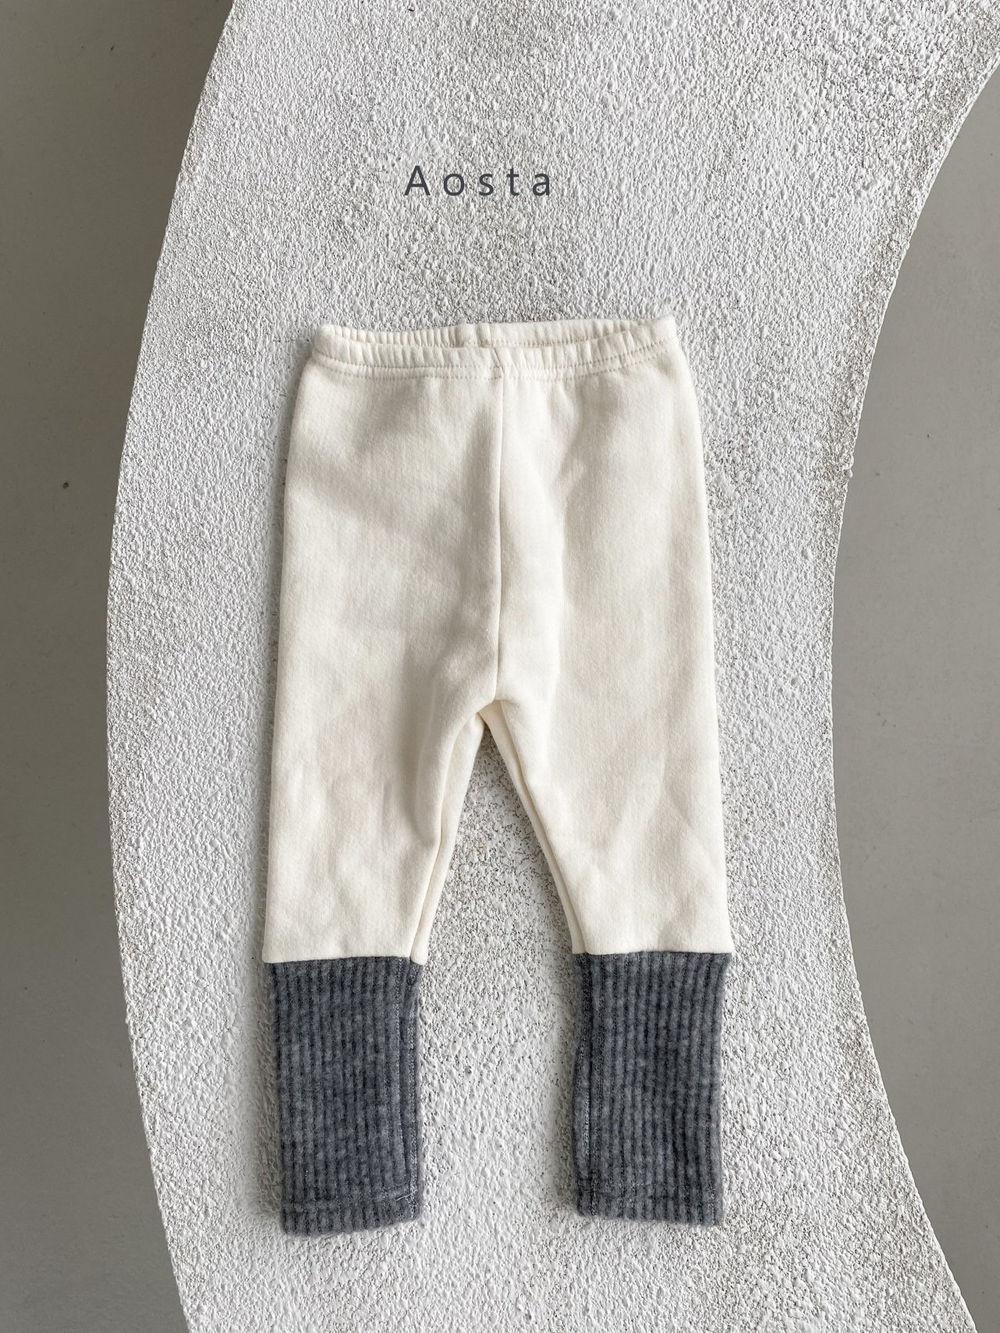 AOSTA - Korean Children Fashion - #Kfashion4kids - Warmer Leggings - 6